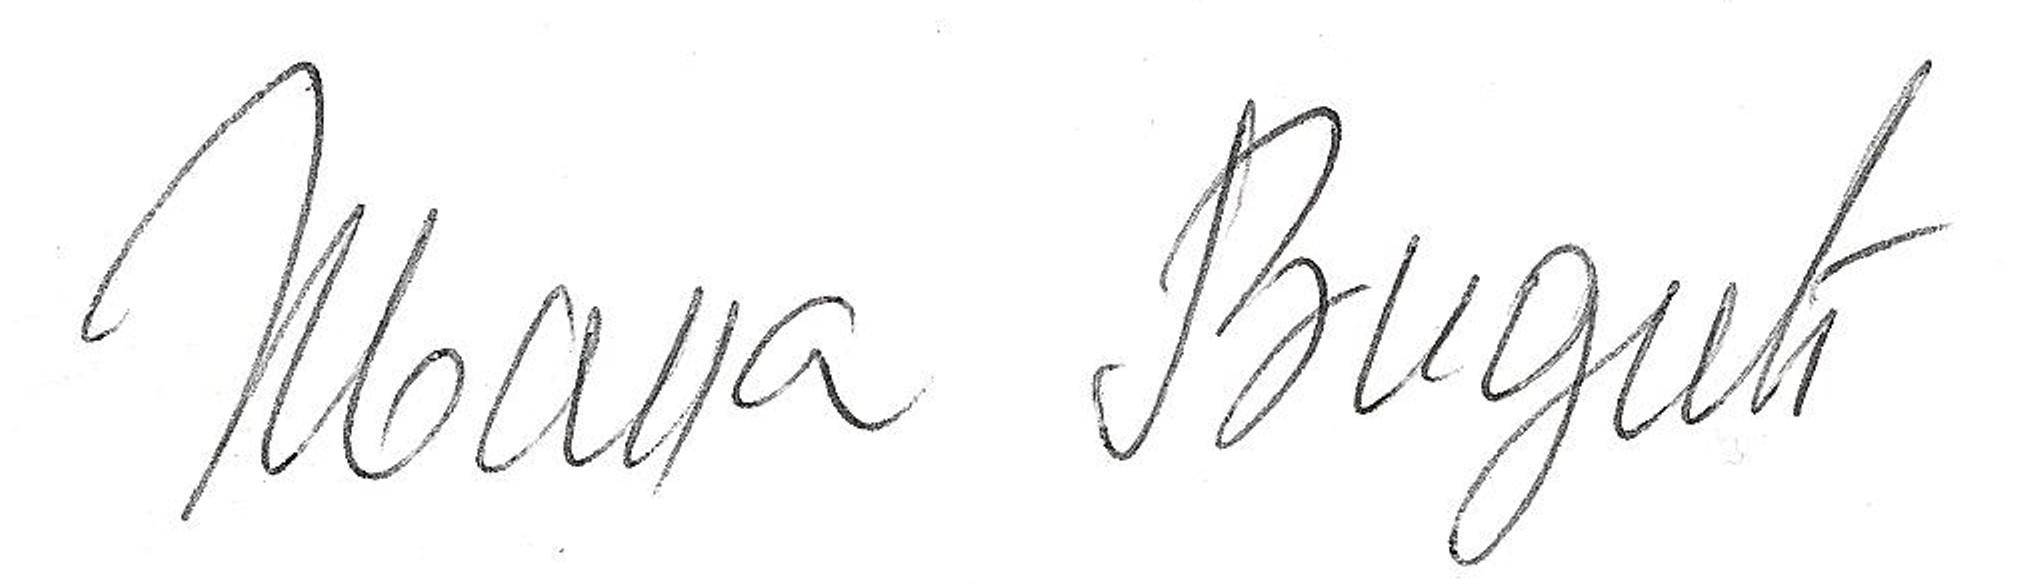 Ivana Vidic's Signature